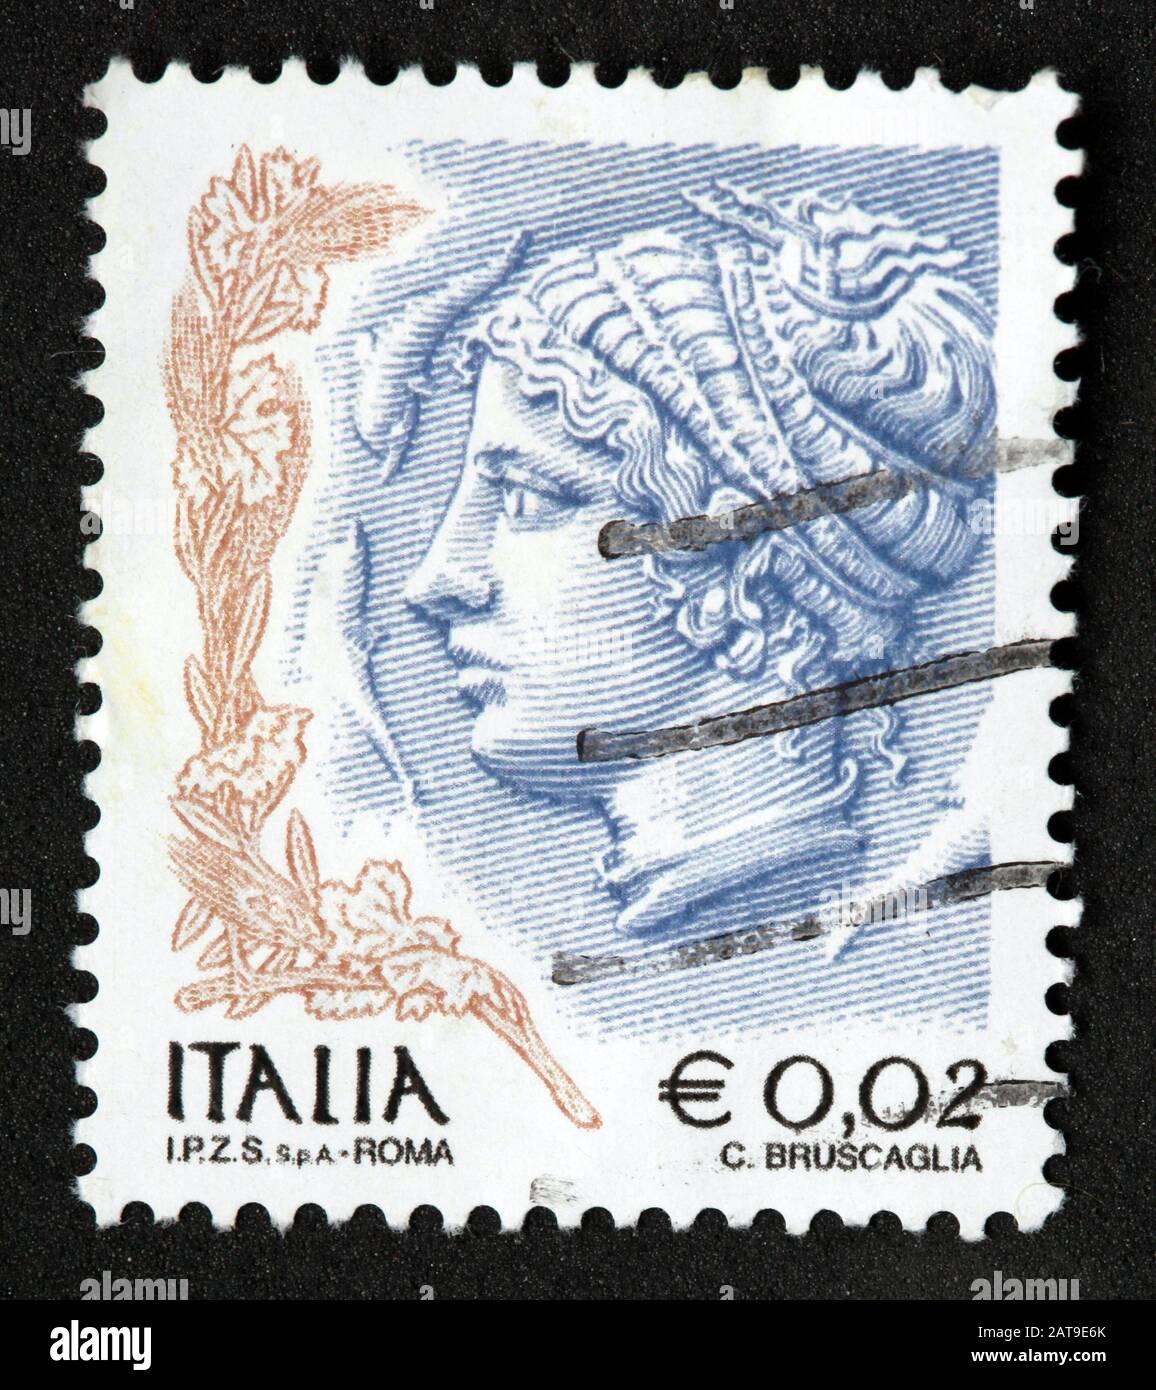 Hotpixuk,@Hotpixuk,GoTonySmith,stamp,postal,franked,frank,used stamps,used franked,used,franked stamp,from envelope,history,historic,old,Italy,Italian,Italia,Italy Stamp,italian stamp,franked Italian stamp,used Italian stamp,Italy stamp,Roma,2c,2cent,woman,female